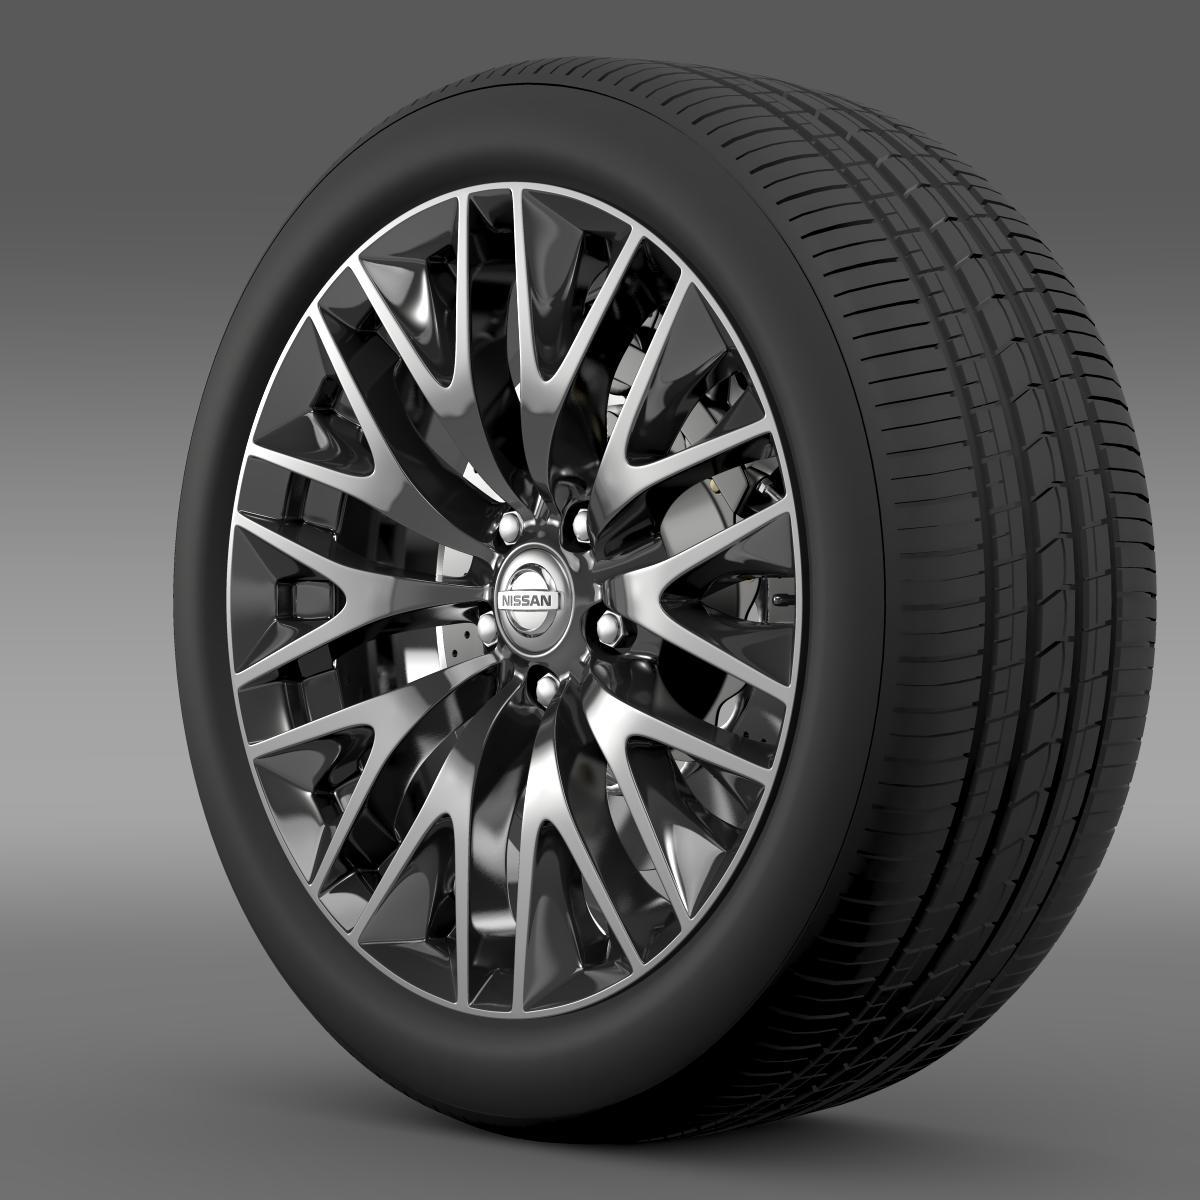 nissan cima hybrid wheel 3d modelo 3ds max fbx c4d lwo ma mb hrc xsi obj 210813